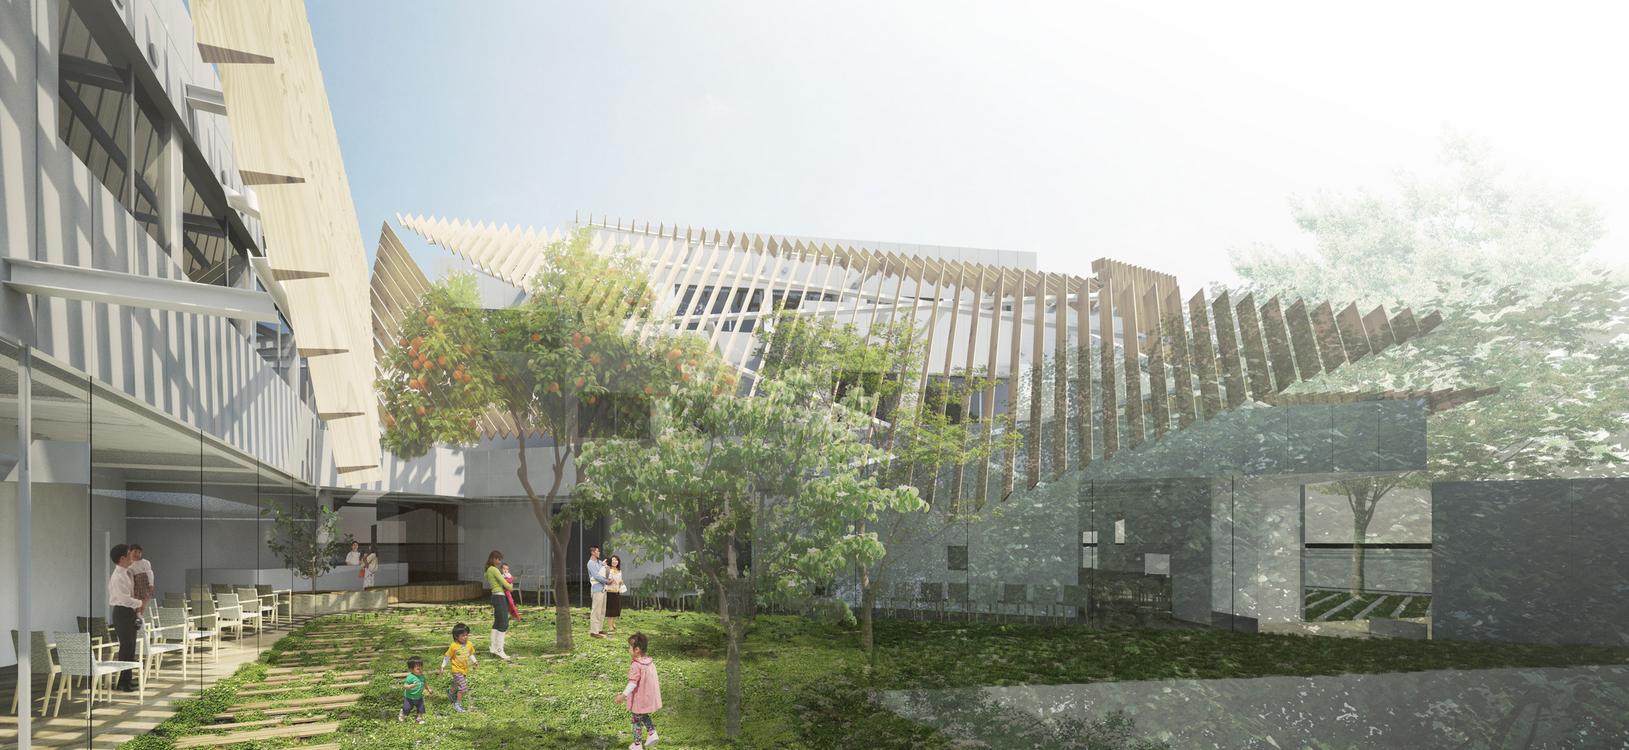 Kengo kuma presenta dise o de hospital verde para tokio for Centro medico ciudad jardin